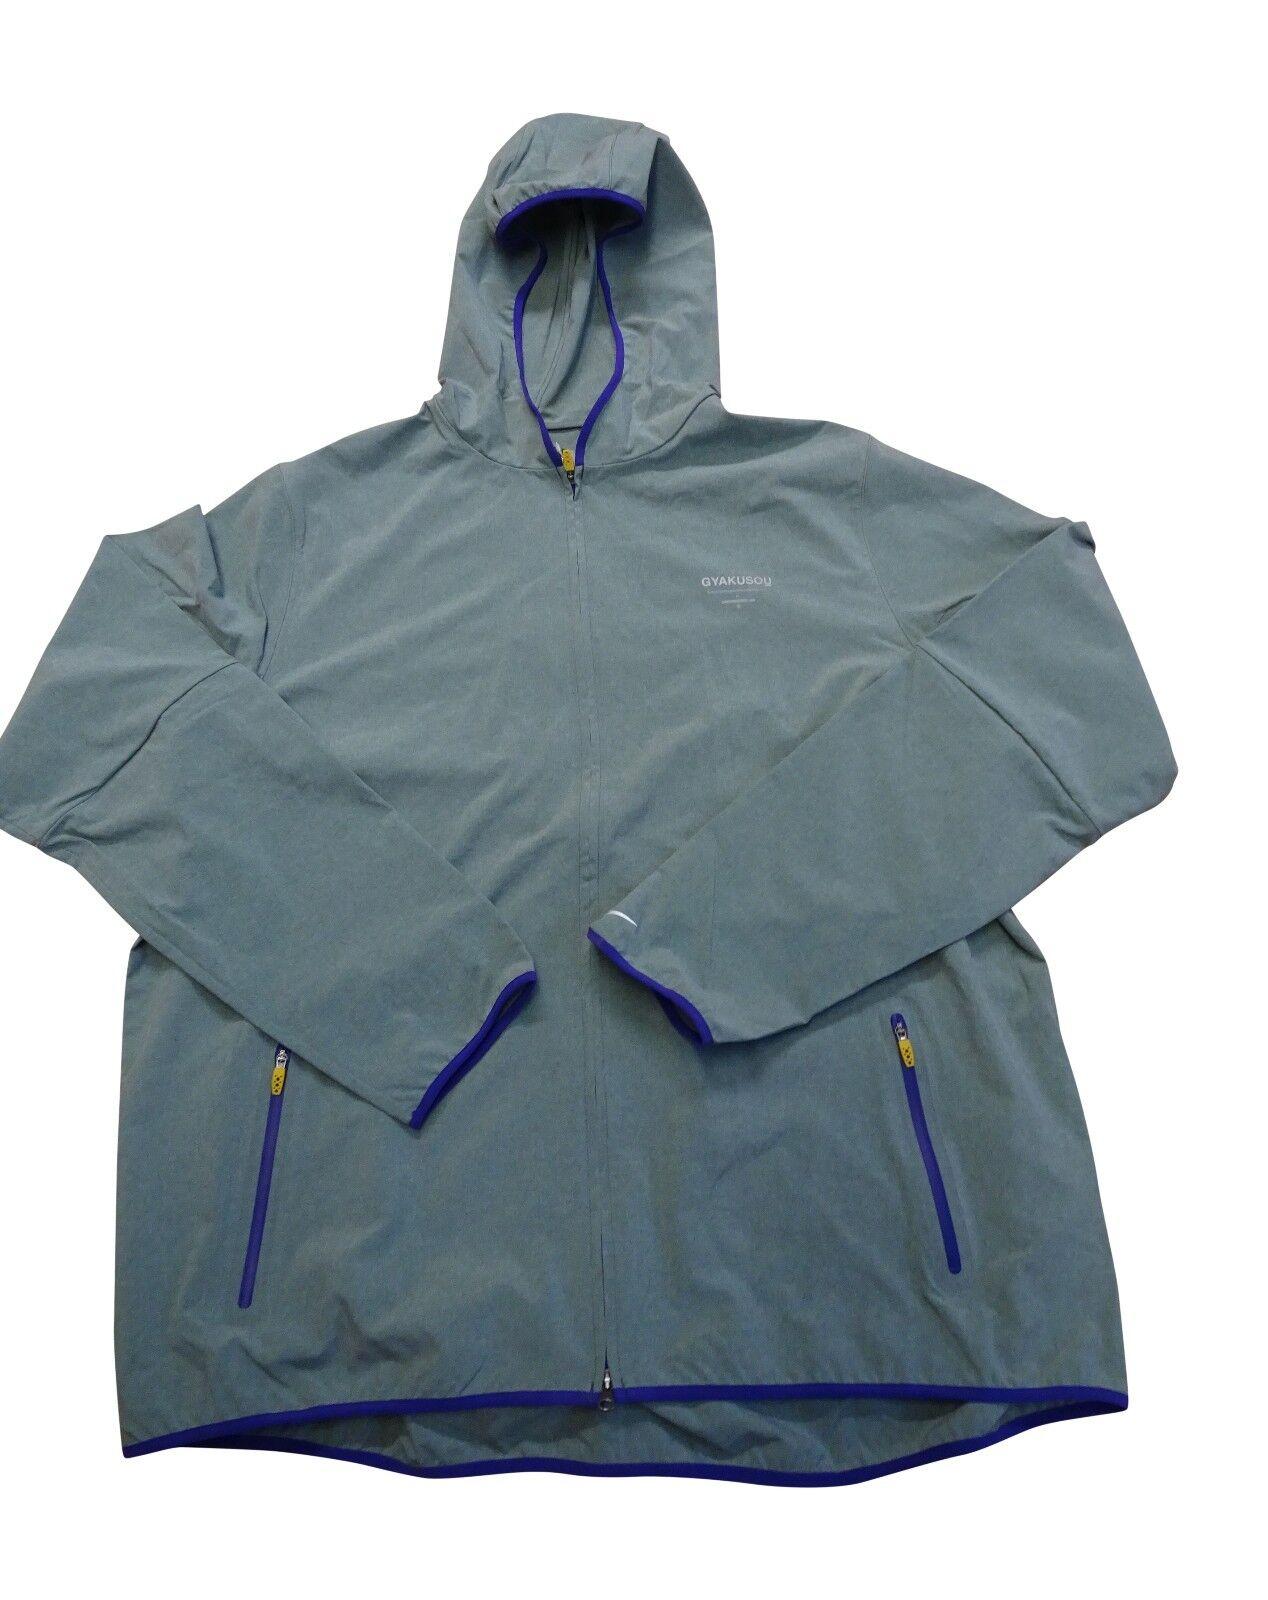 Nike Lab X Undercover Gyakusou Herren Nicht Gefüttert Stretch Jacke mit Kapuze